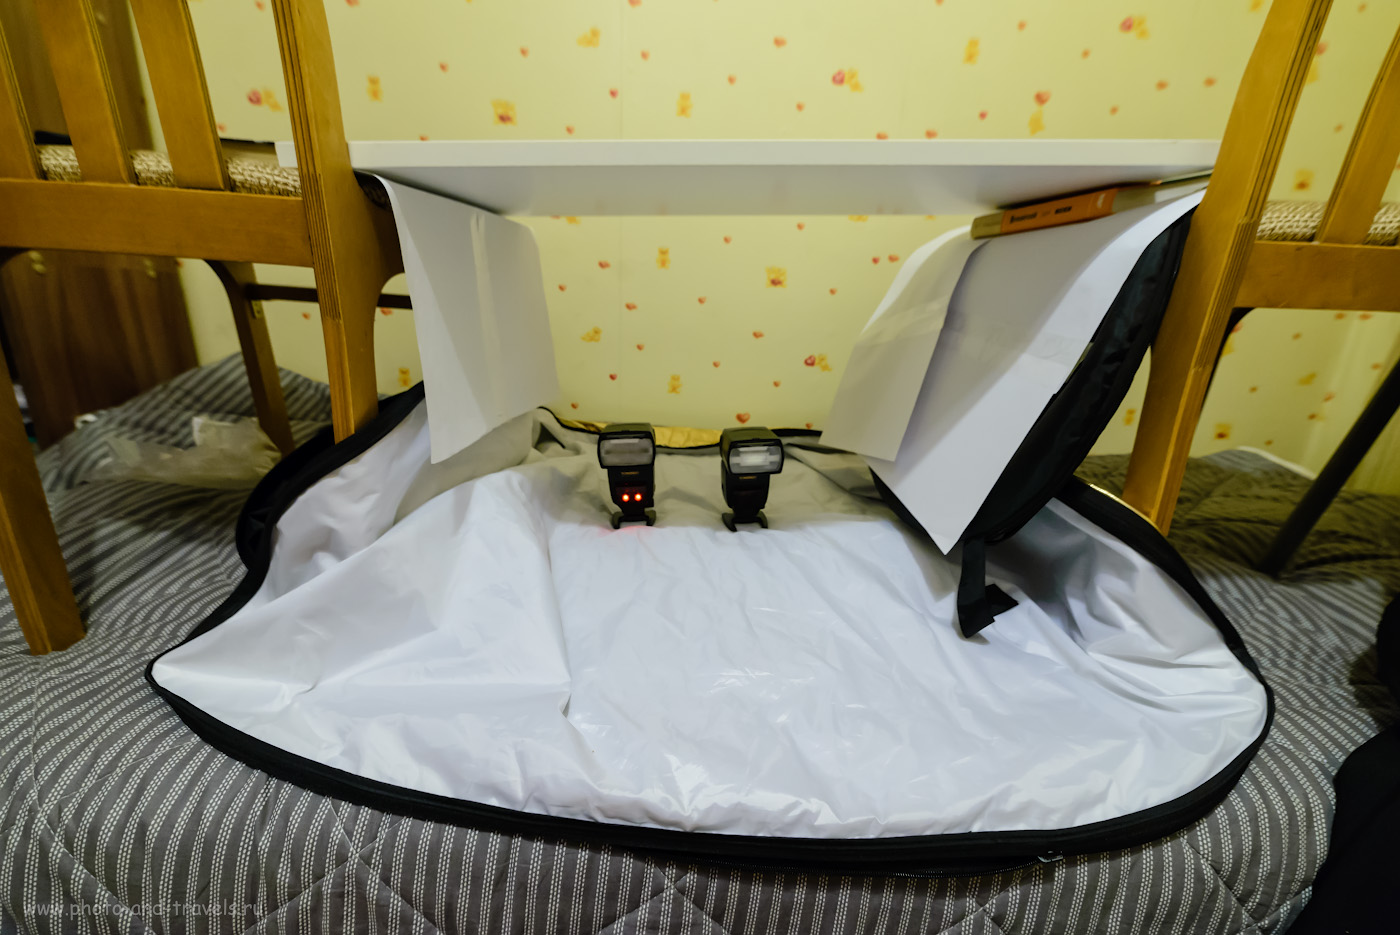 Фотография 6. Как сделать софтбокс для съемки в домашних условиях. На фото – две внешних вспышки Yongnuo YN-685N. Снято на фуллфреймовую зеркалку Nikon D610 и ширик Samyang 14mm f/2.8 при свете от энергосберегающих ламп, без вспышек. Настройки: 1/30, 5.6, 2800, 14.